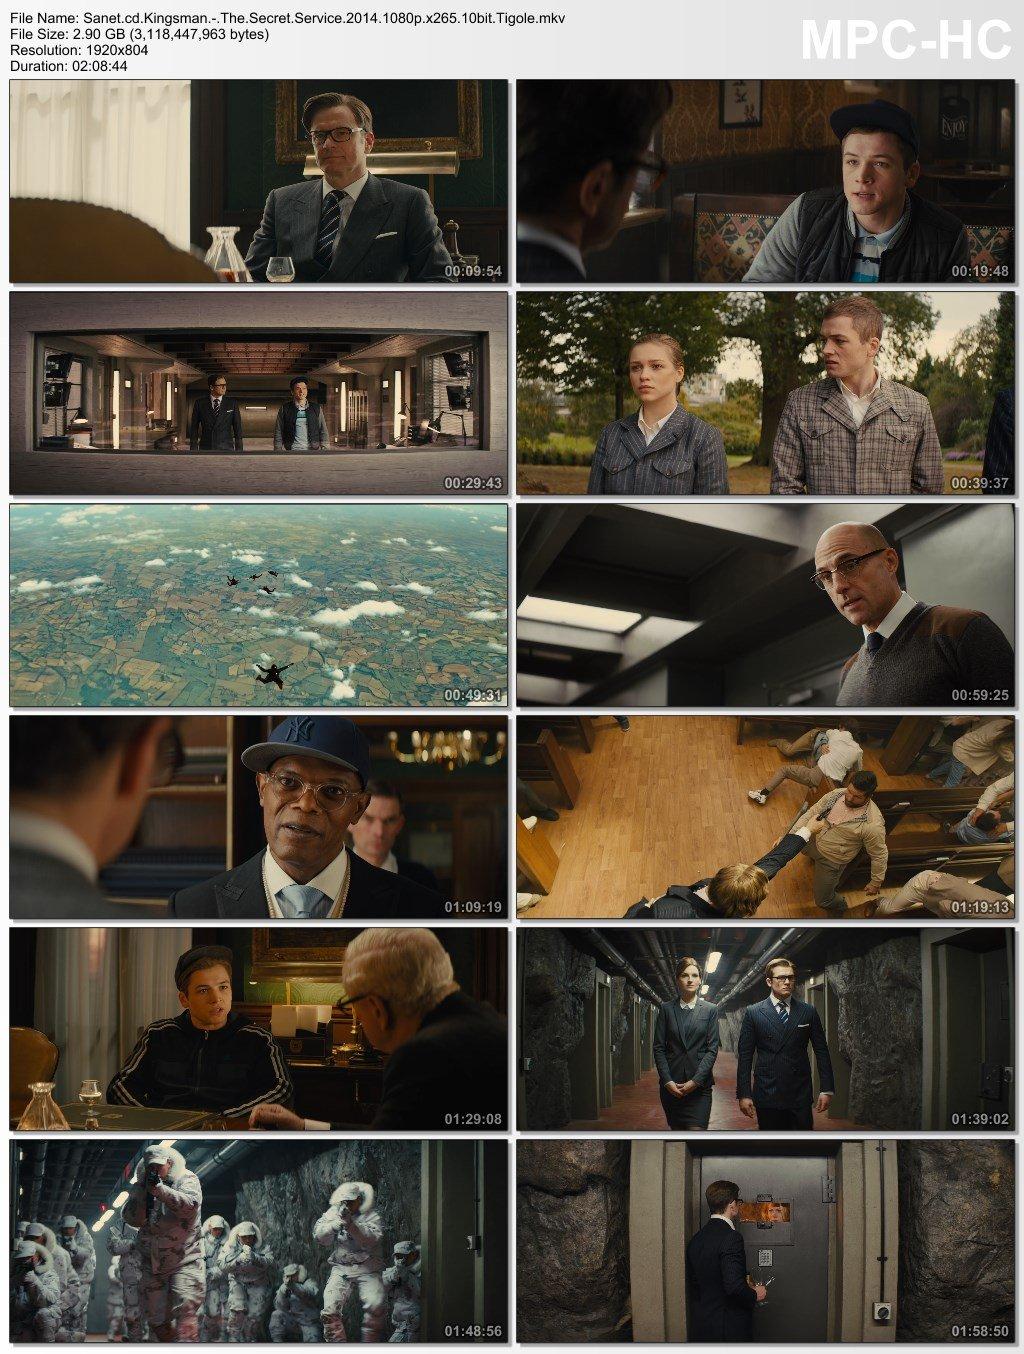 Download Film Kingsman The Secret Service Bluray 1080p Site Tieflav98os